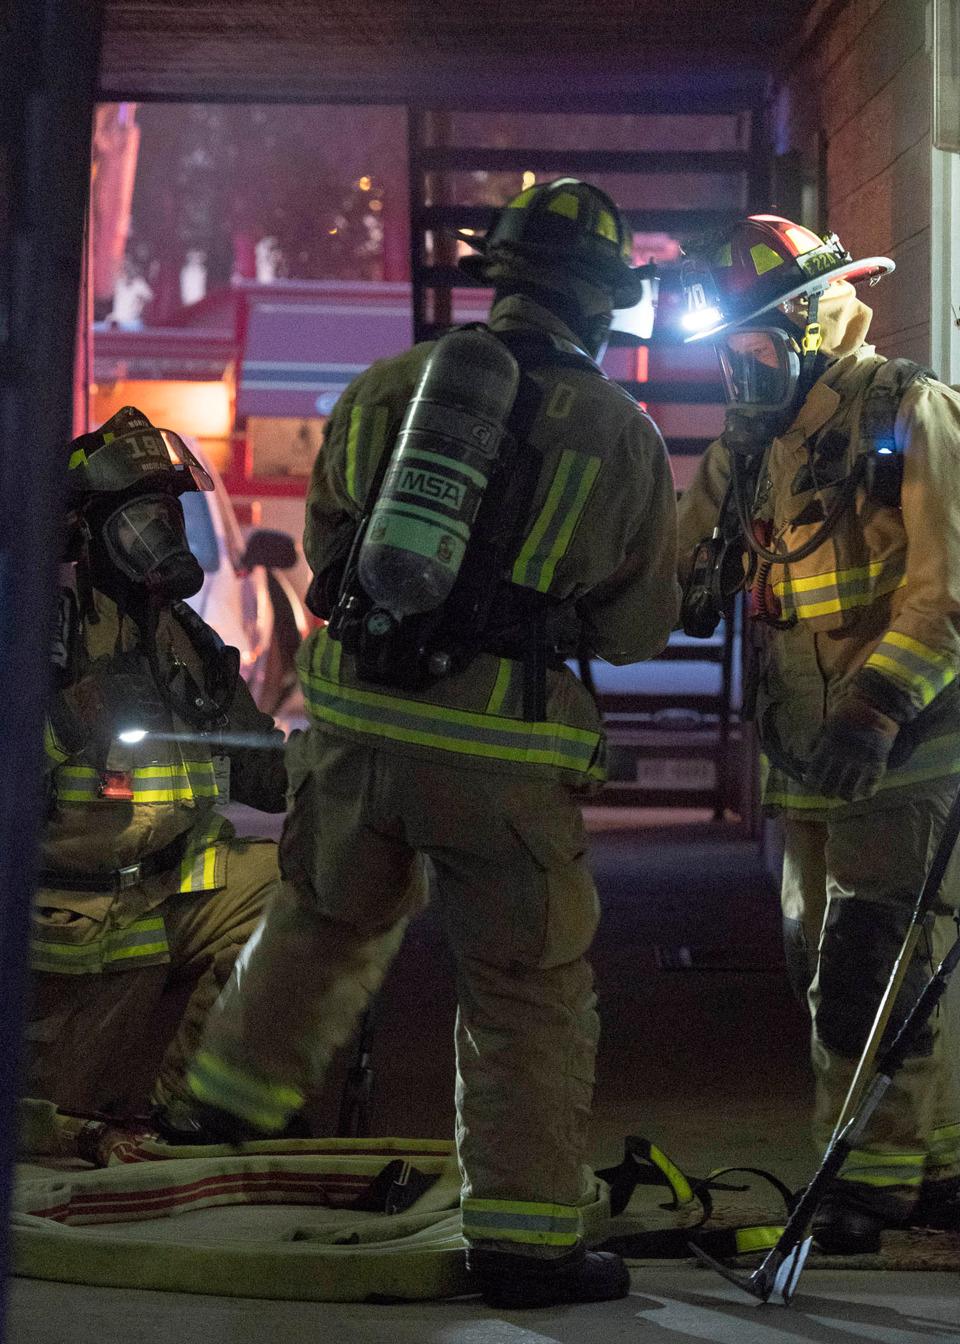 Fireground Photos - Three-Alarm Fire at North Richland Hills